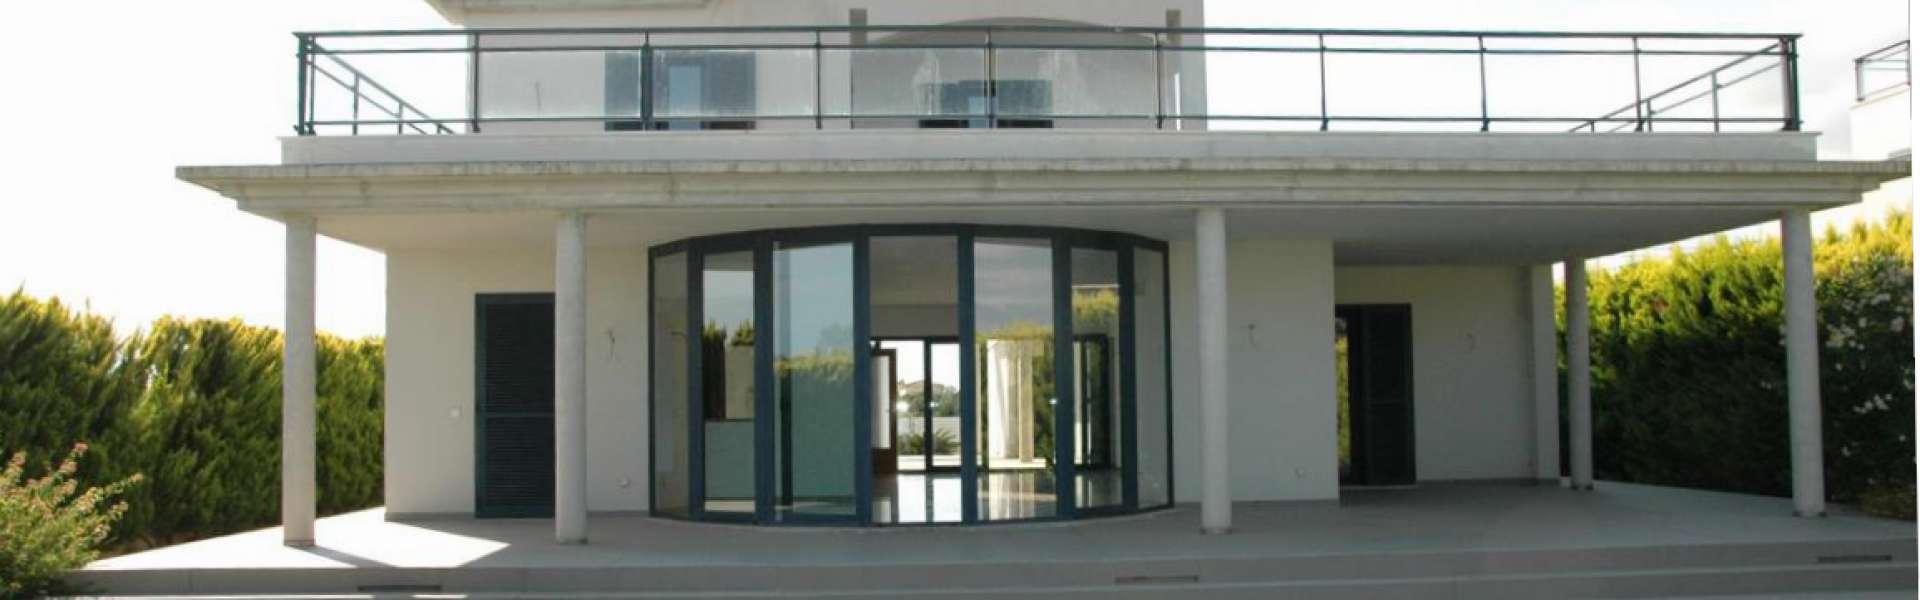 Sa Rapita - Meerblick Villa in ruhiger Lage